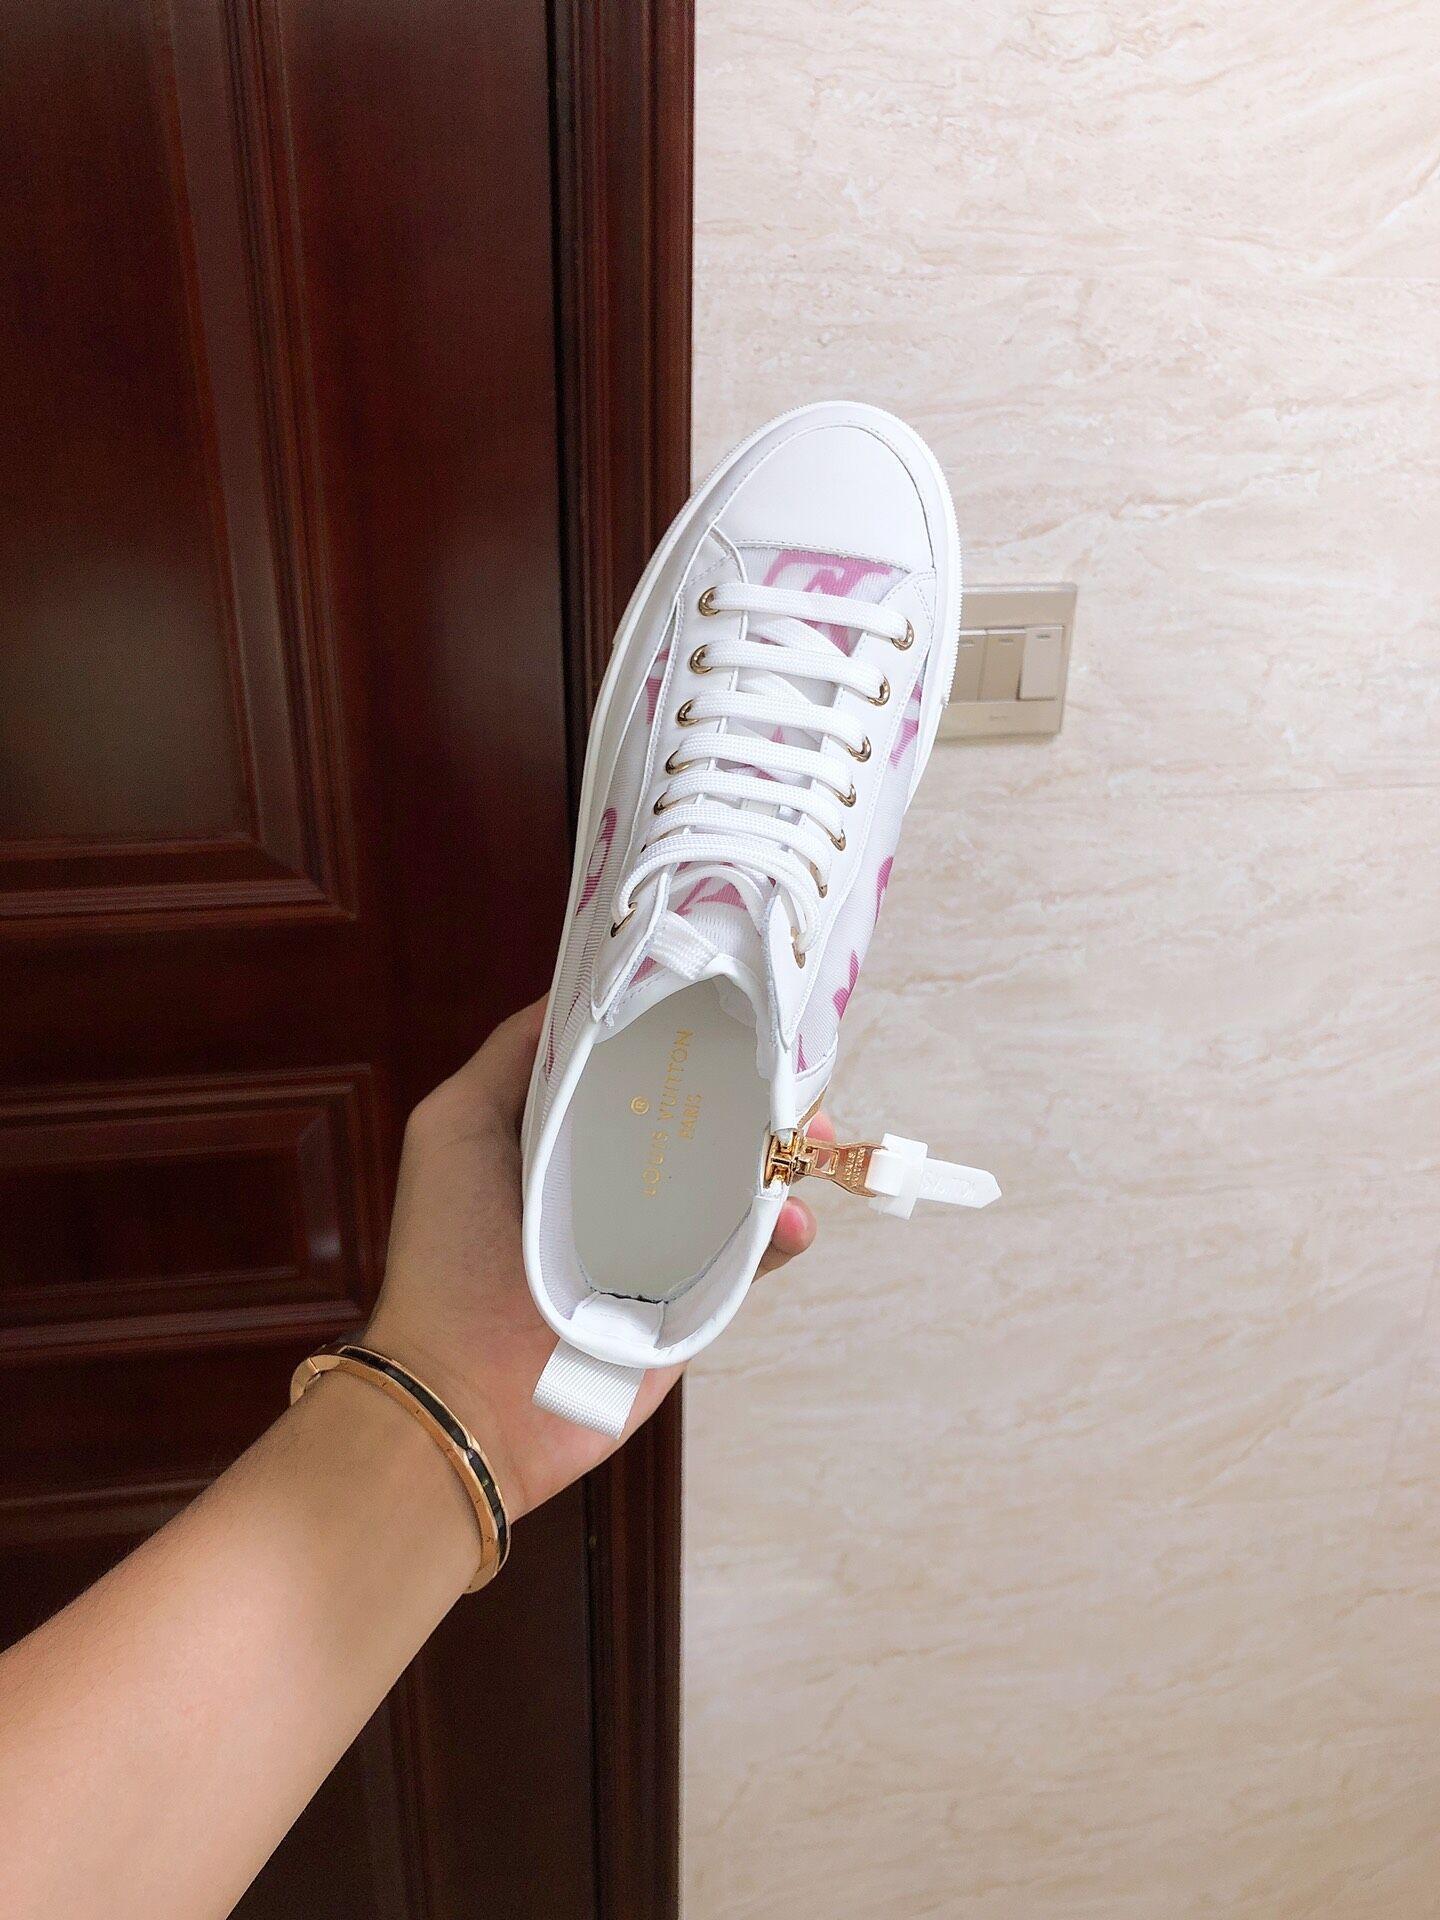 stellar sneaker boot black    sneaker    shoes    women shoes 1A87E6  12